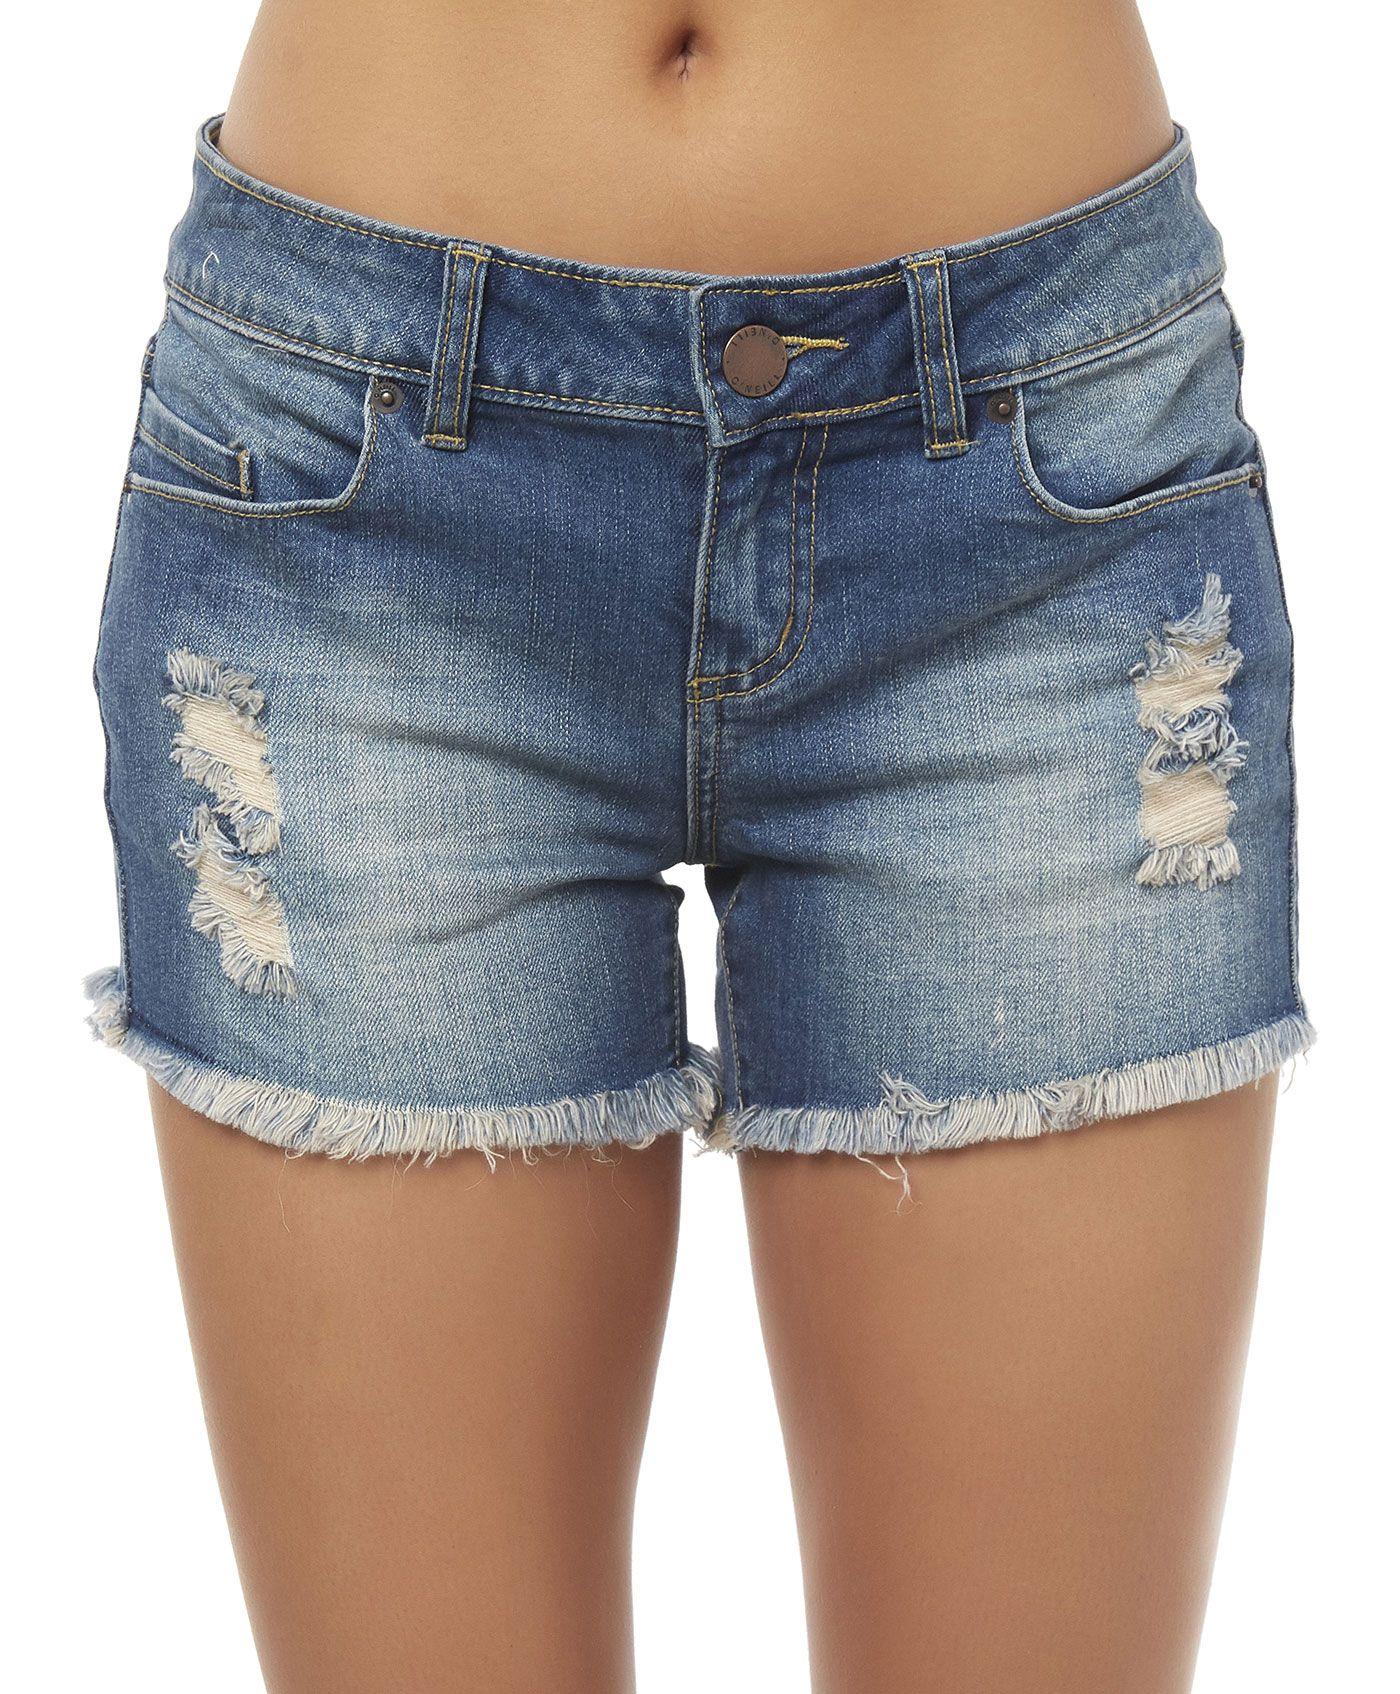 O'Neill Women's Cody Denim Shorts